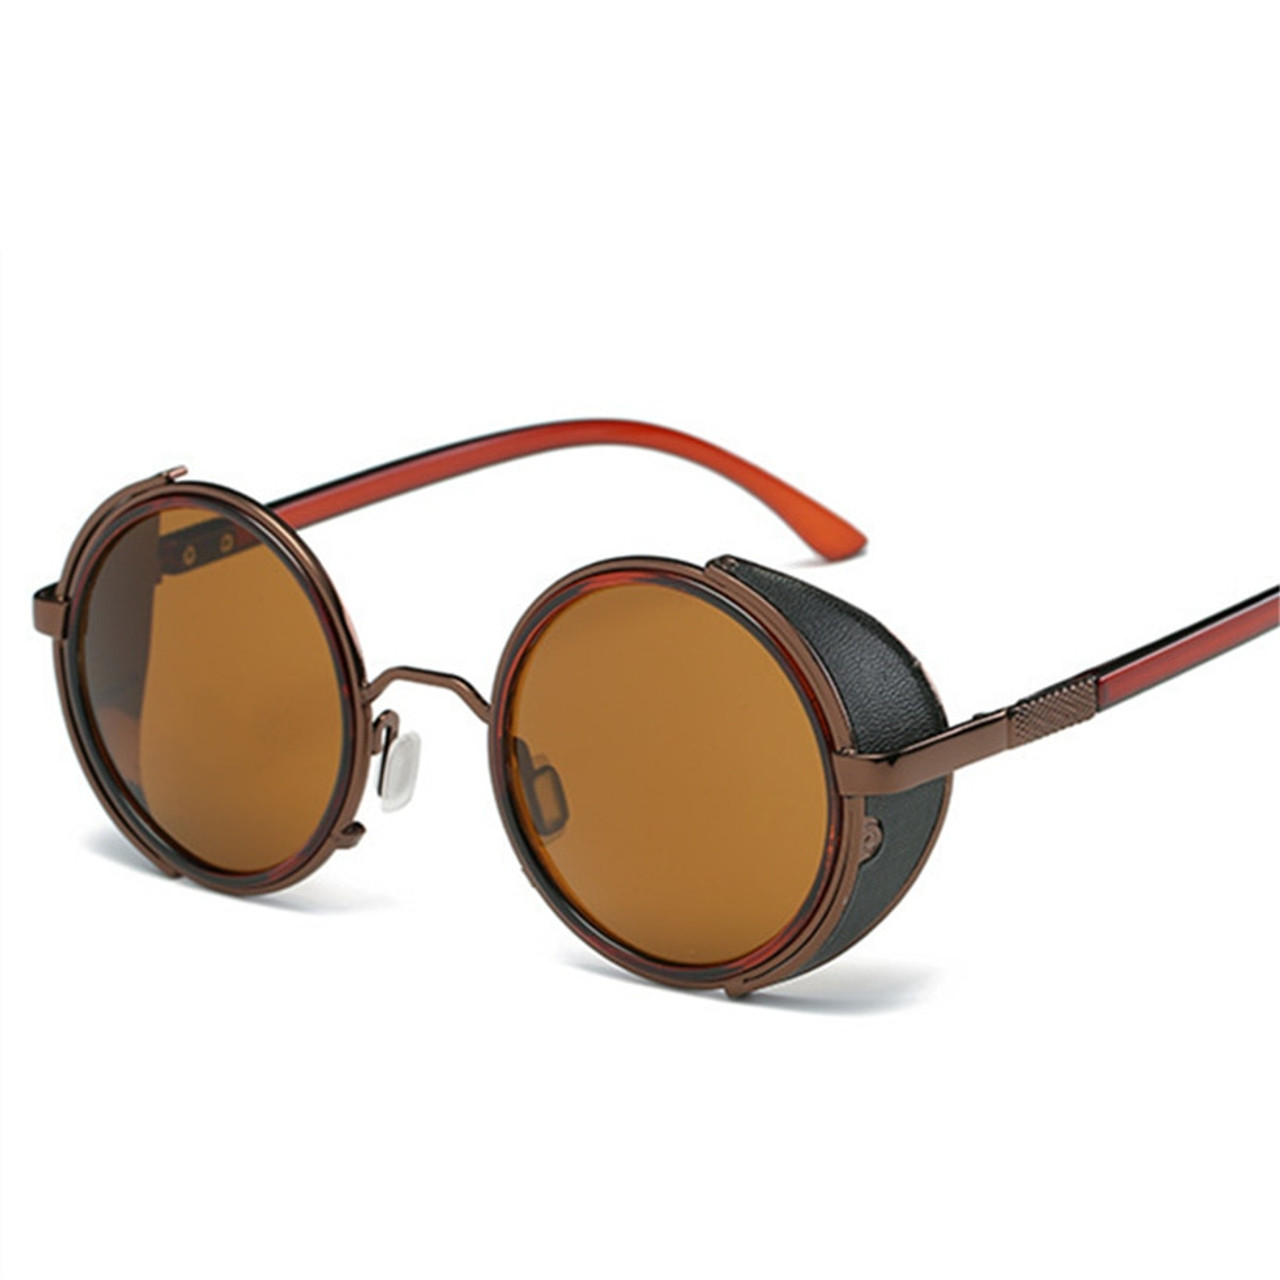 5f780d14f2 ... BARCUR Vintage Aluminum Magnesium Sun glass Men Polarized Sunglasses  Round Steampunk Shades Brand Designer Eyewear ...